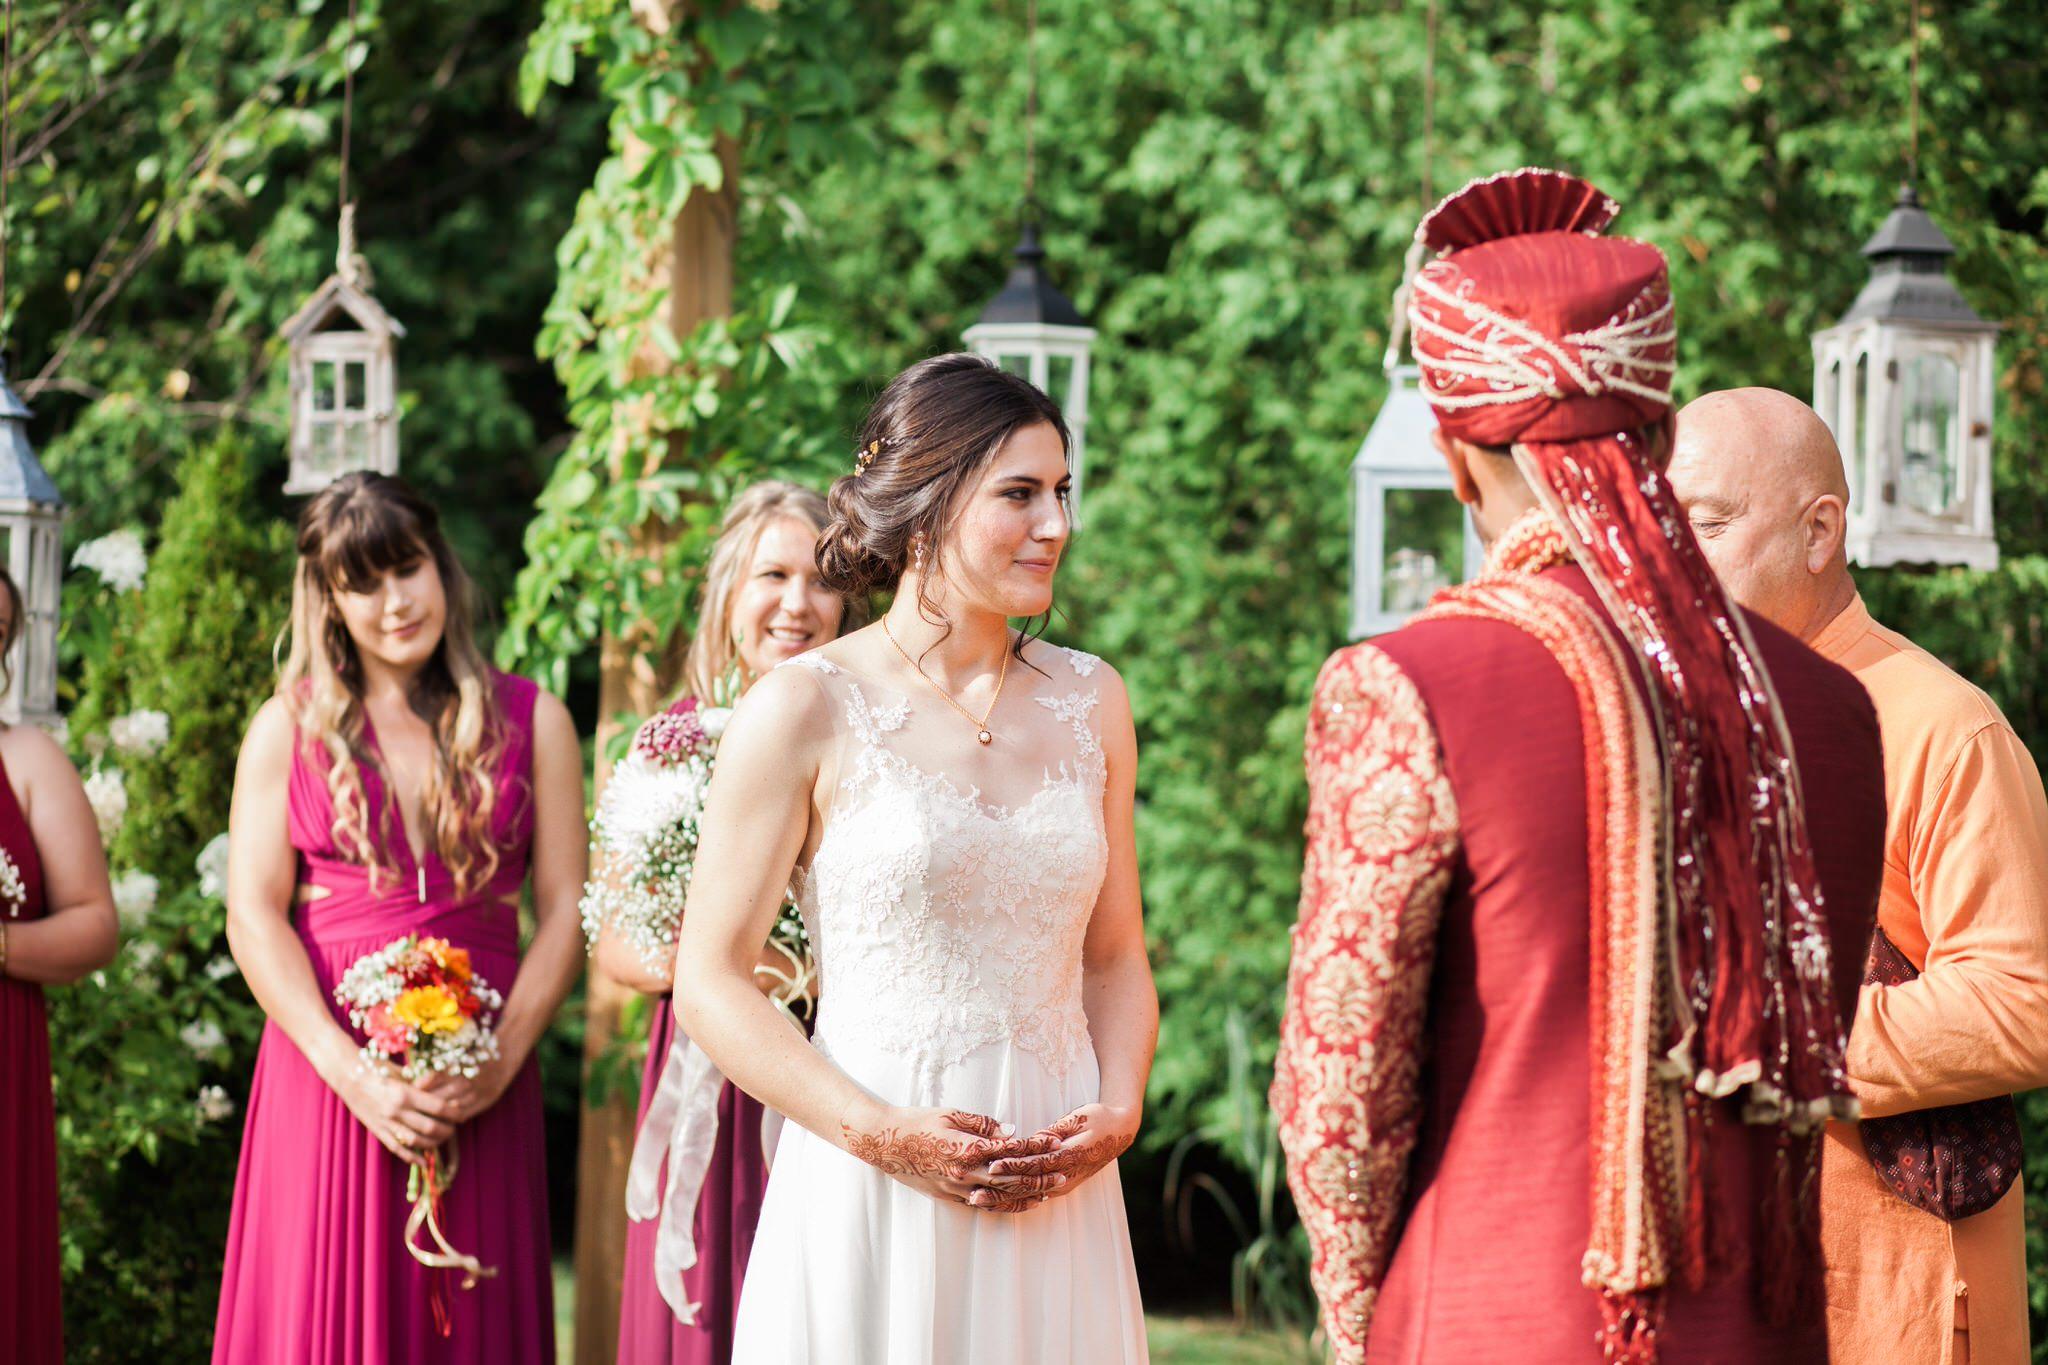 Northview Gardens Wedding - bride and groom - hindu wedding